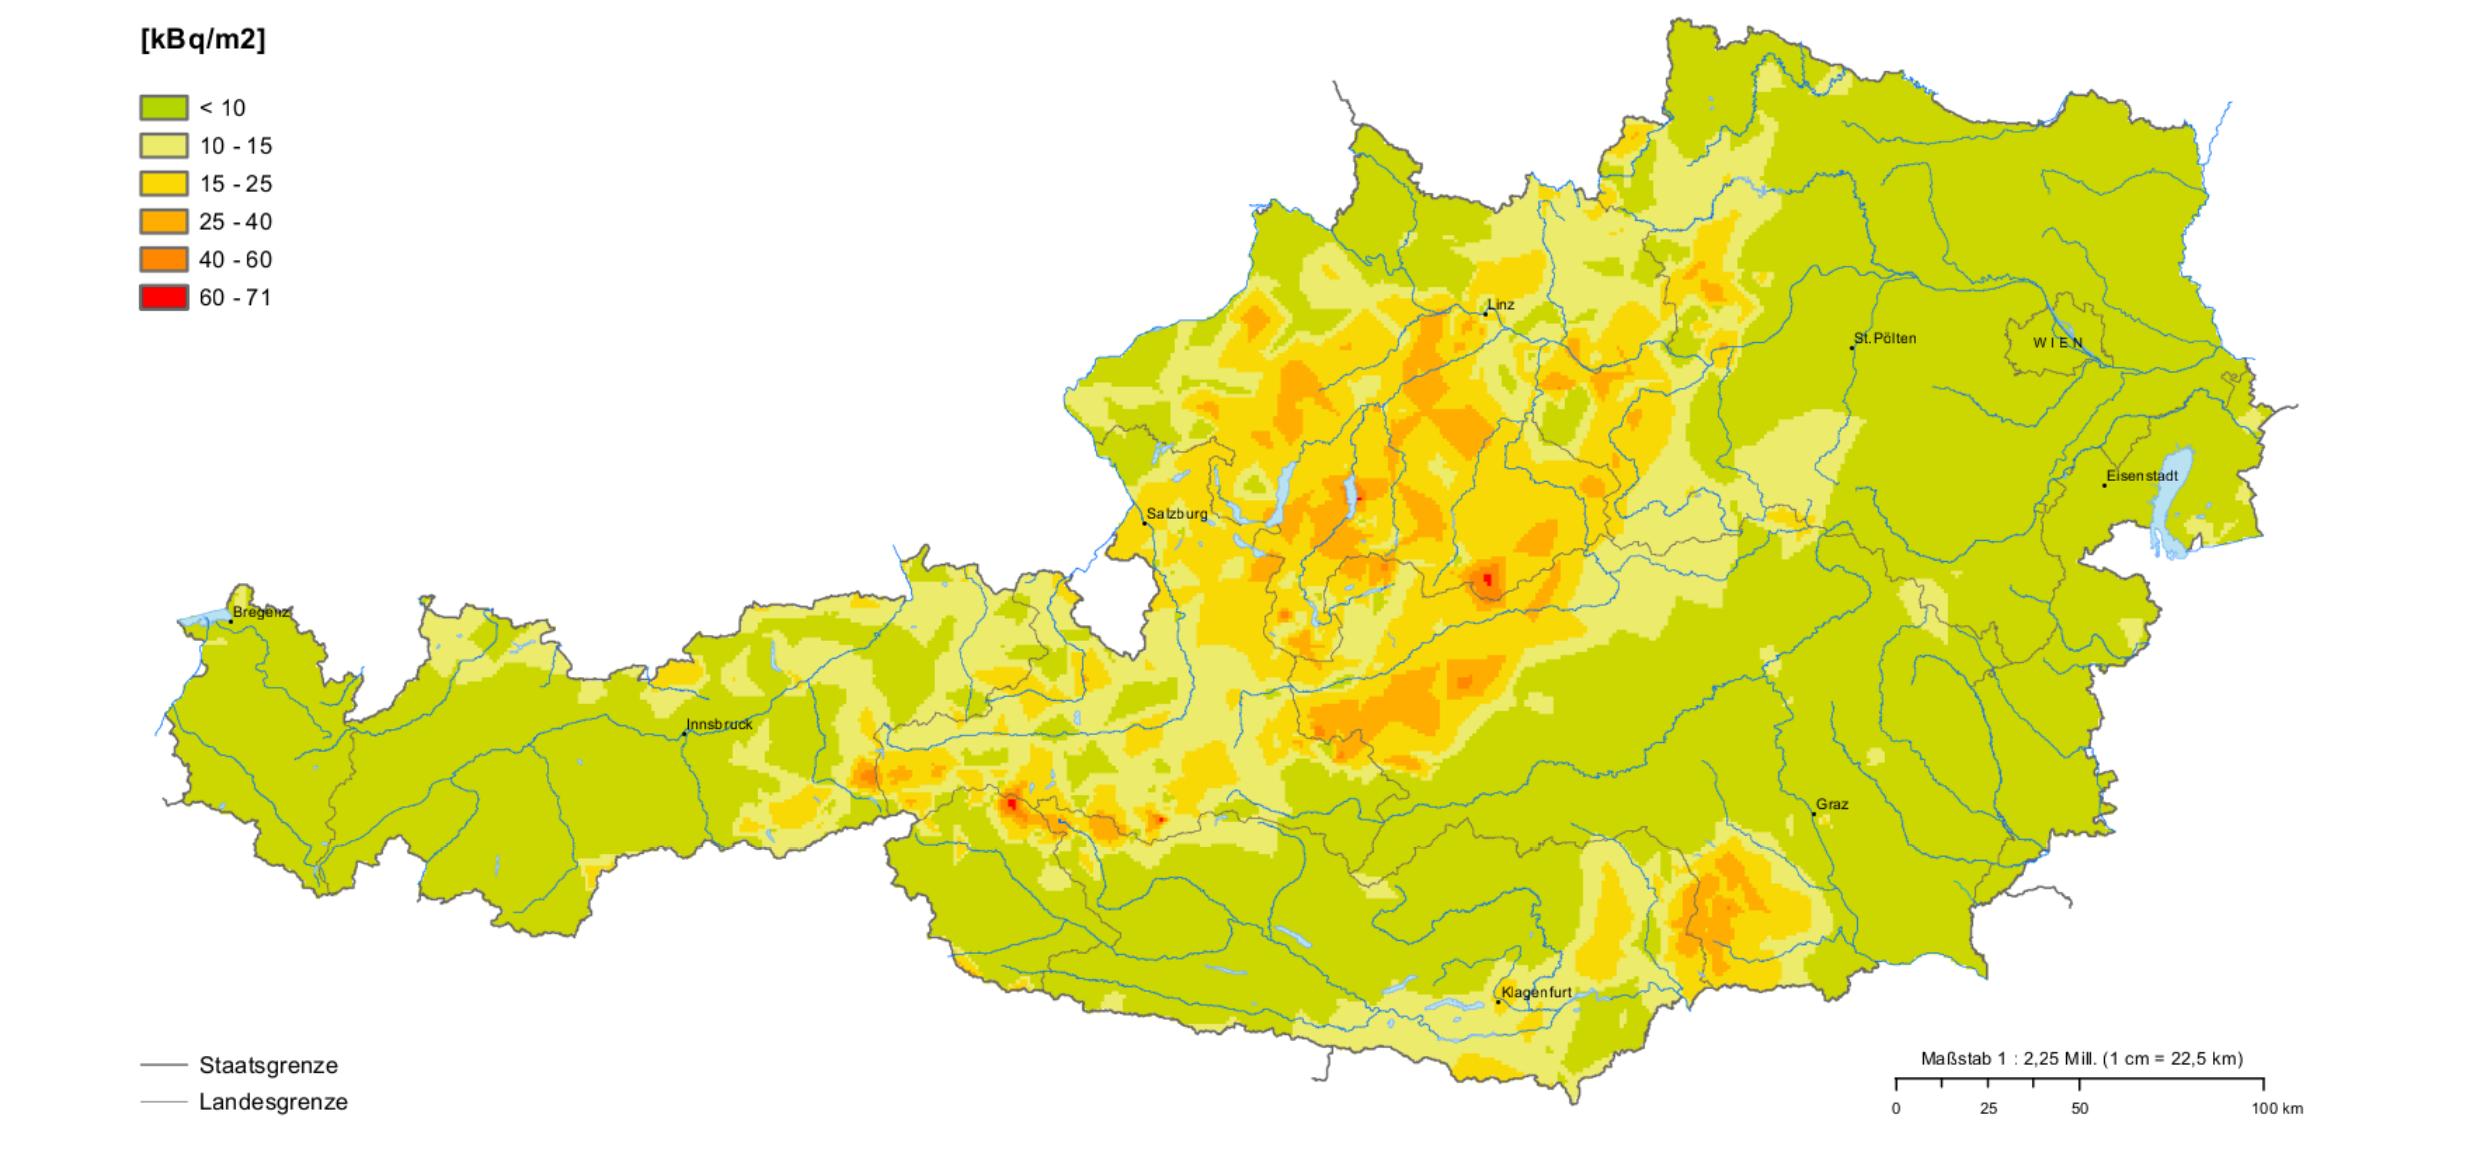 Landkarte mit Caesium-Hotspots.png